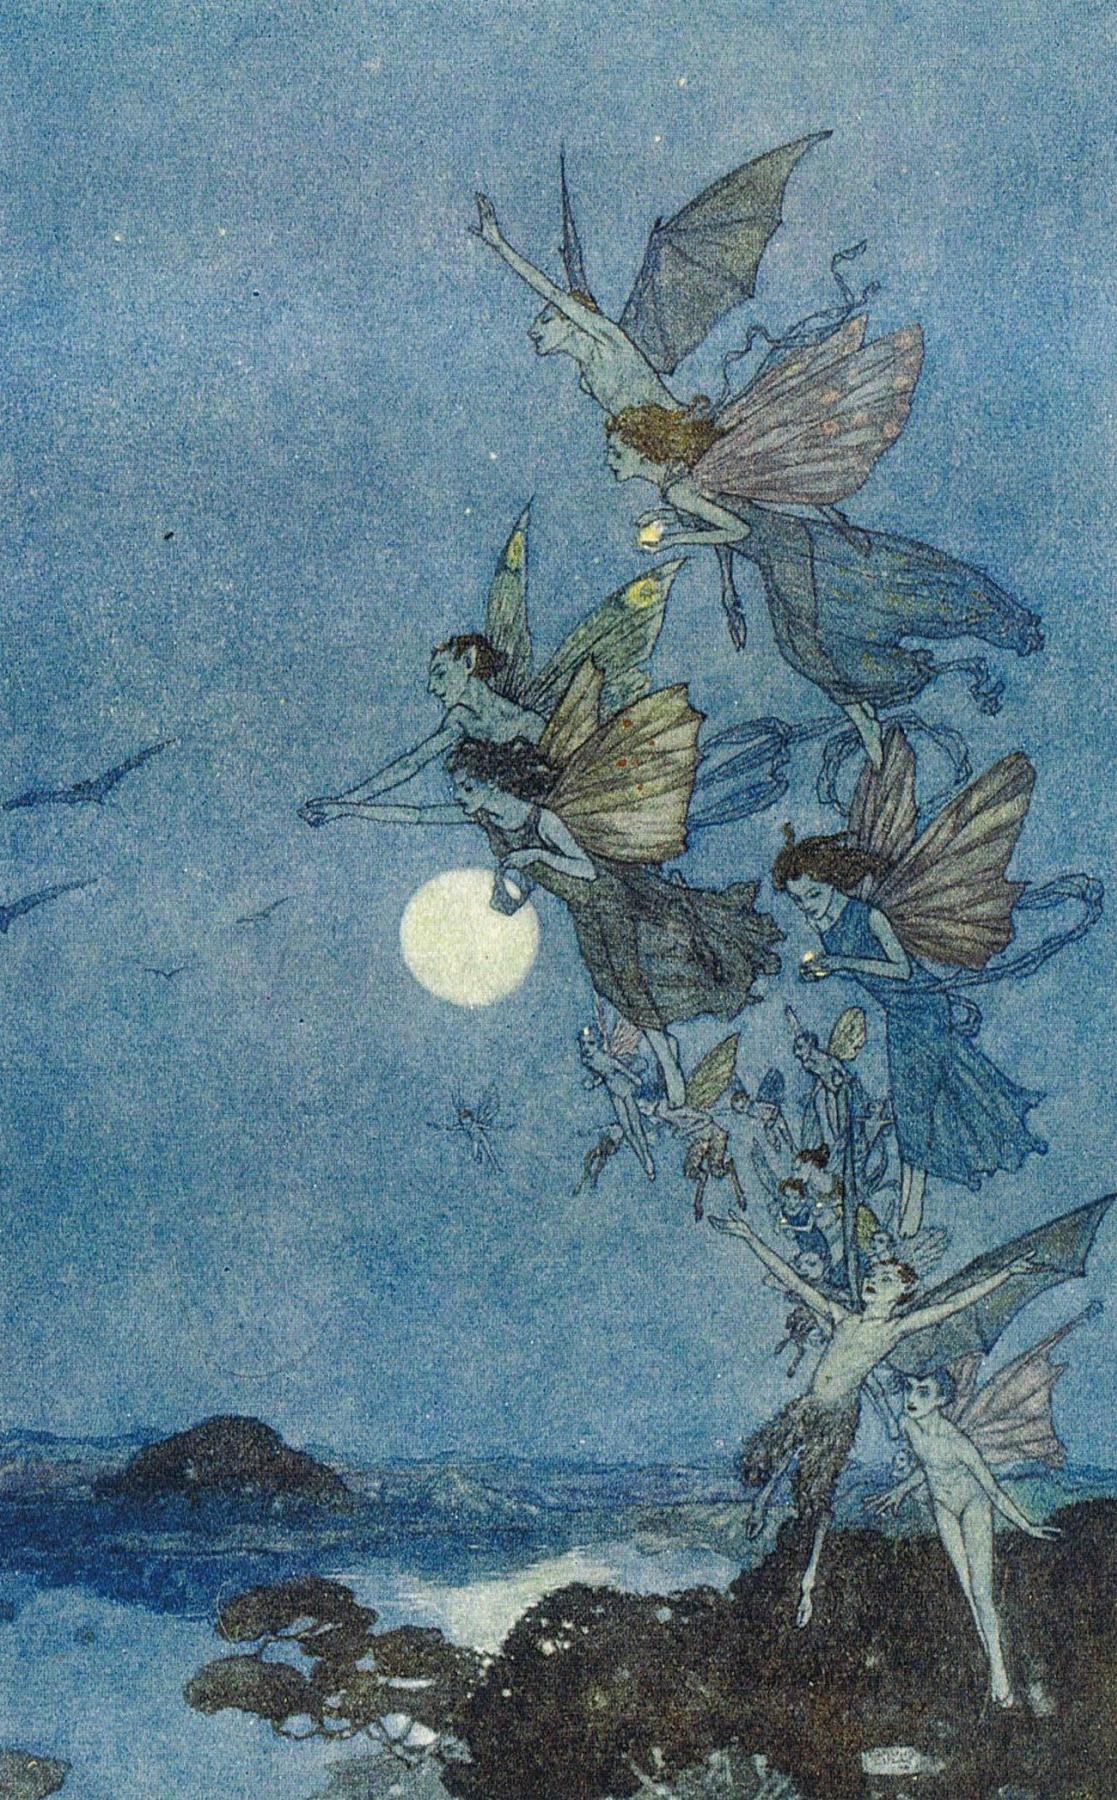 Эдмунд Дюлак. Маленькие феи